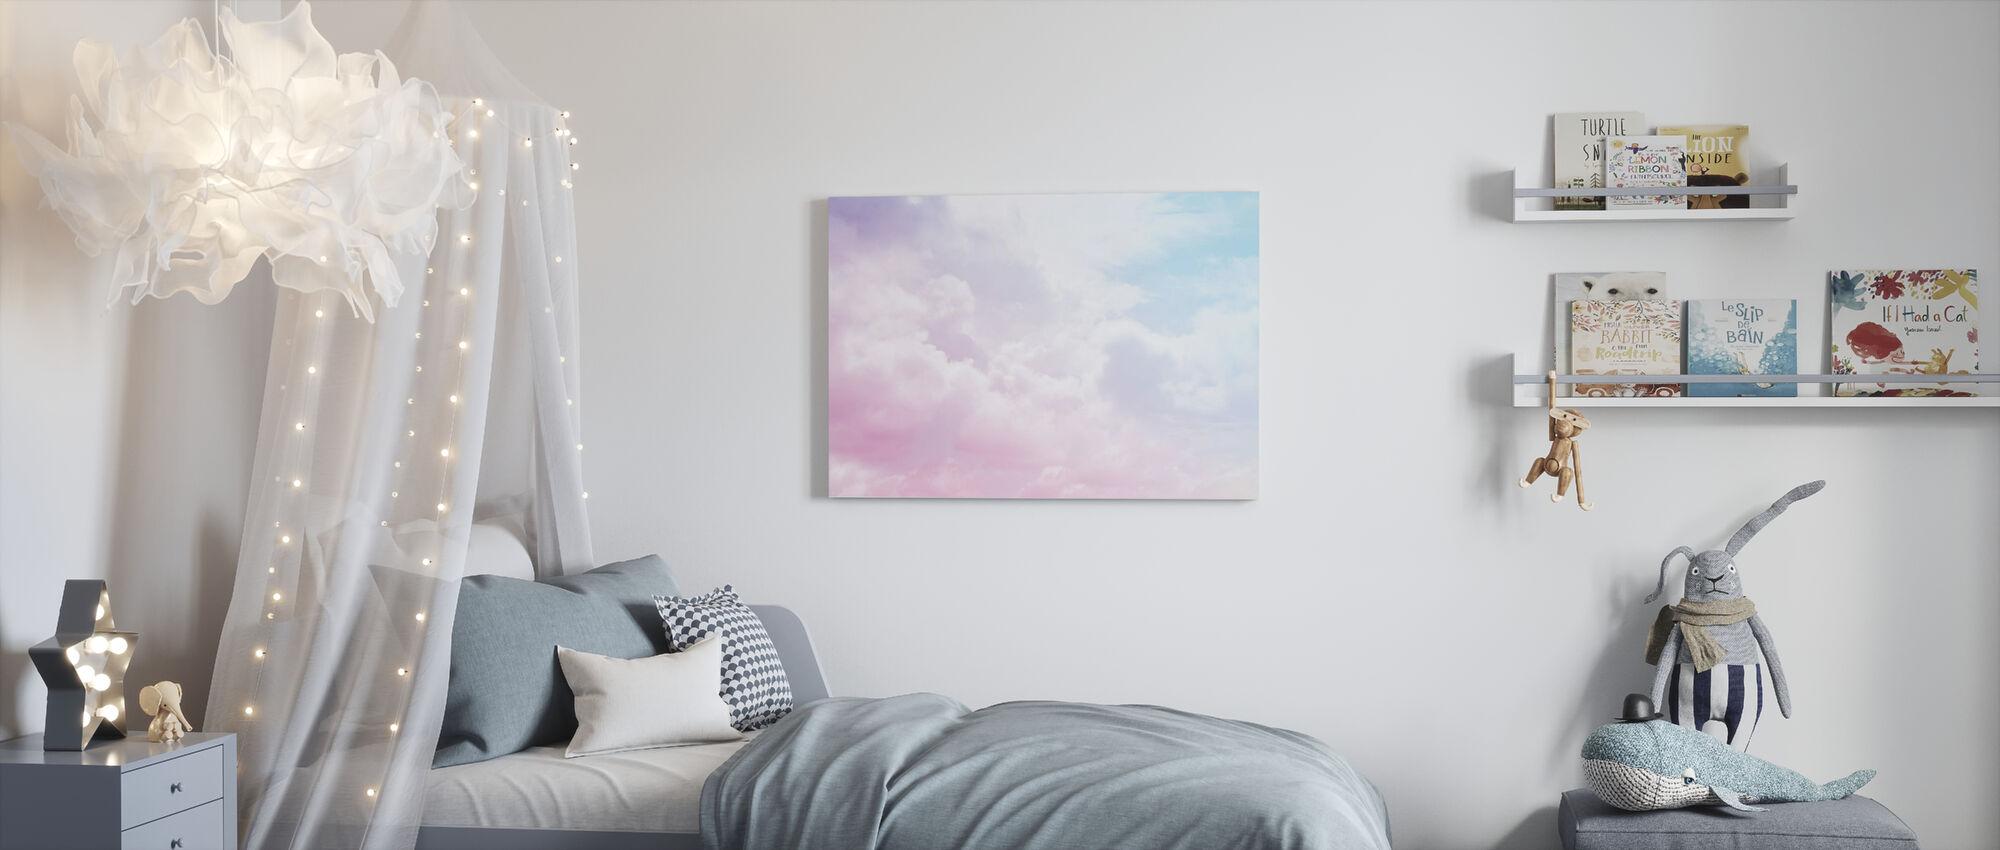 Cloudy Sky - Canvas print - Kids Room